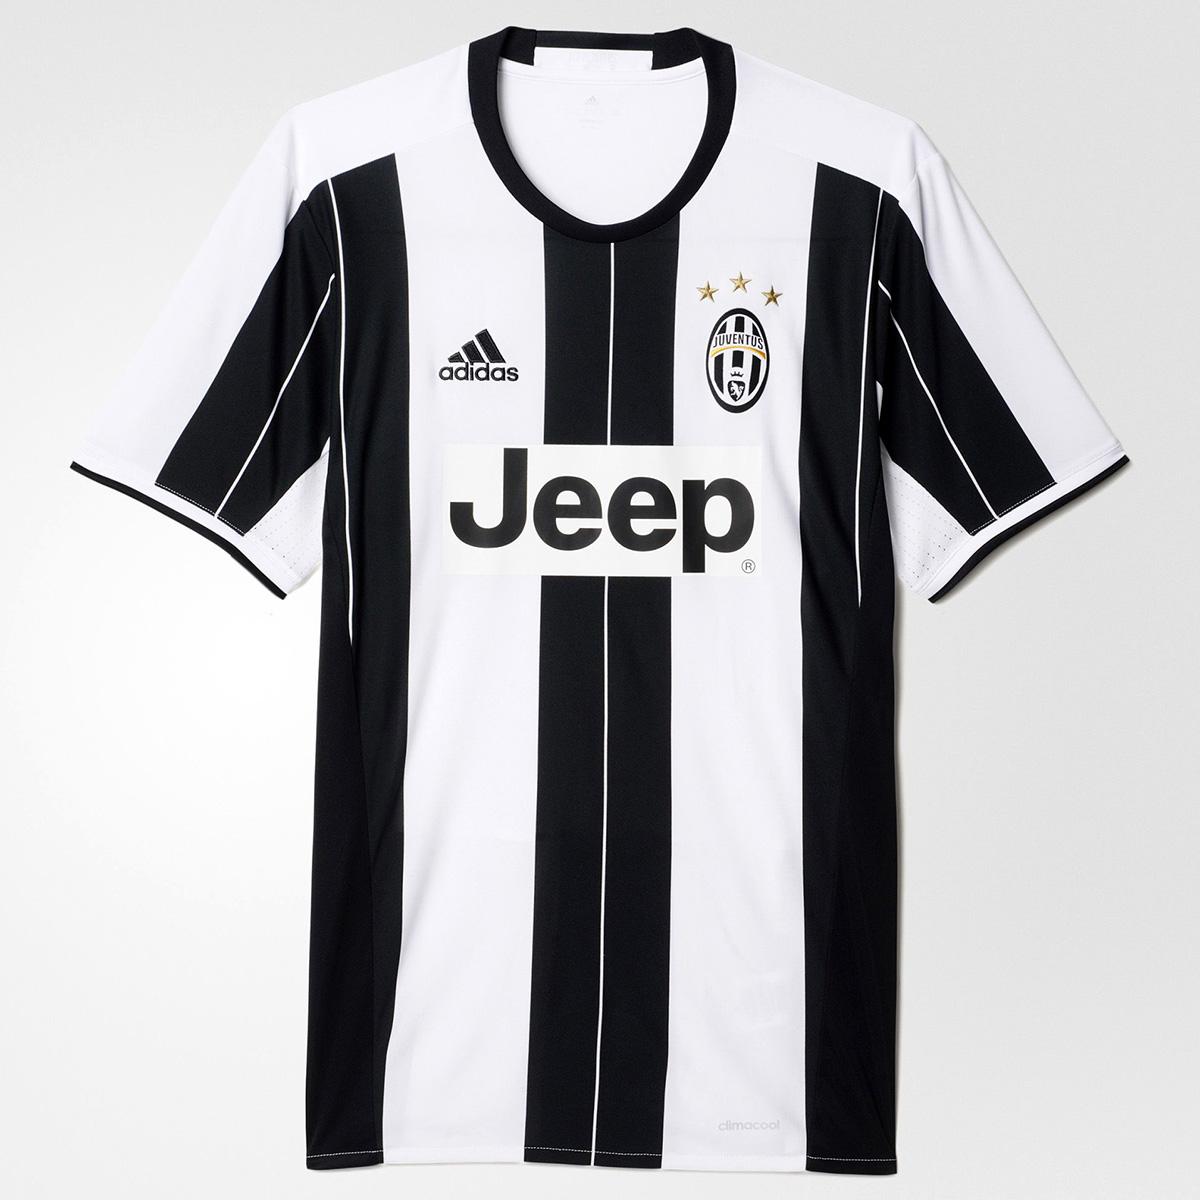 Adidas Juventus Fc   Home Replica Jersey Soccer Merchandise